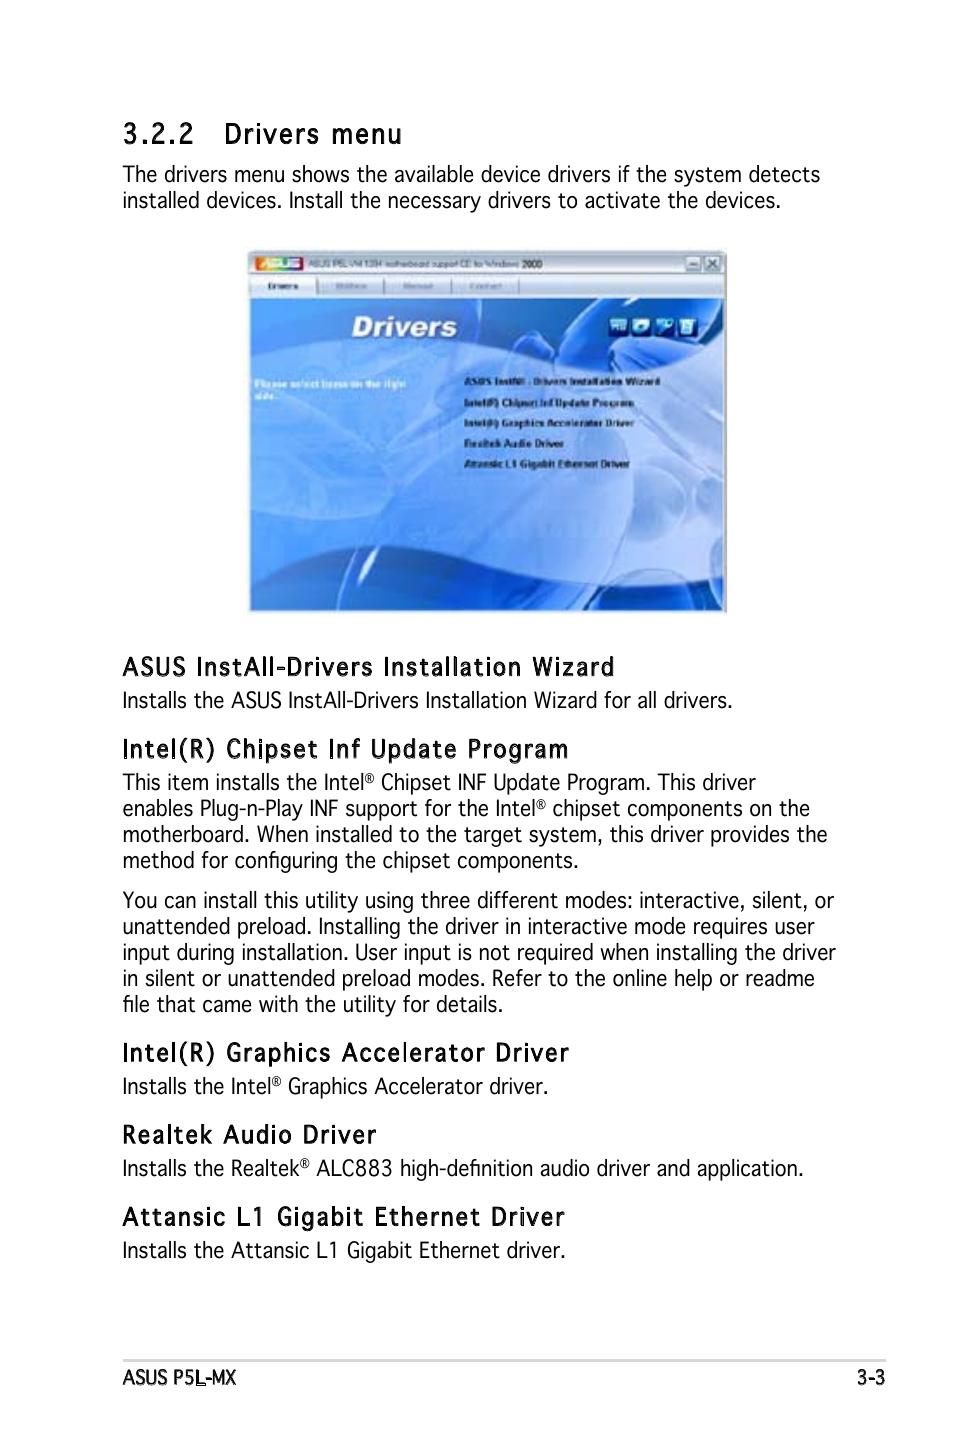 2 drivers menu, Asus install-drivers installation wizard